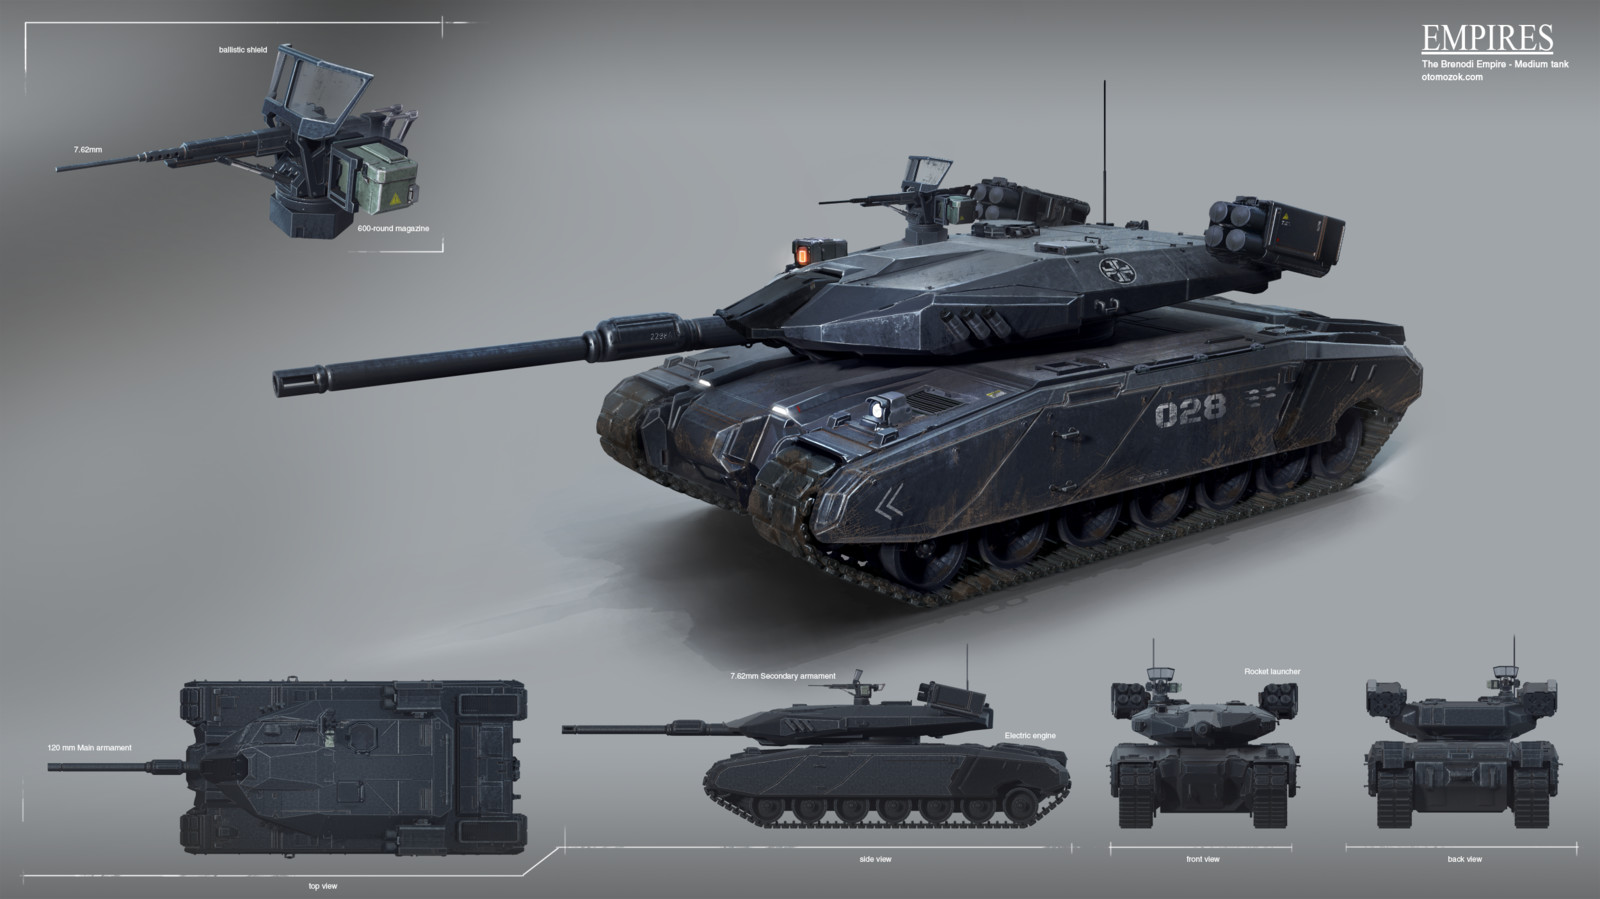 EMPIRES - Tanks